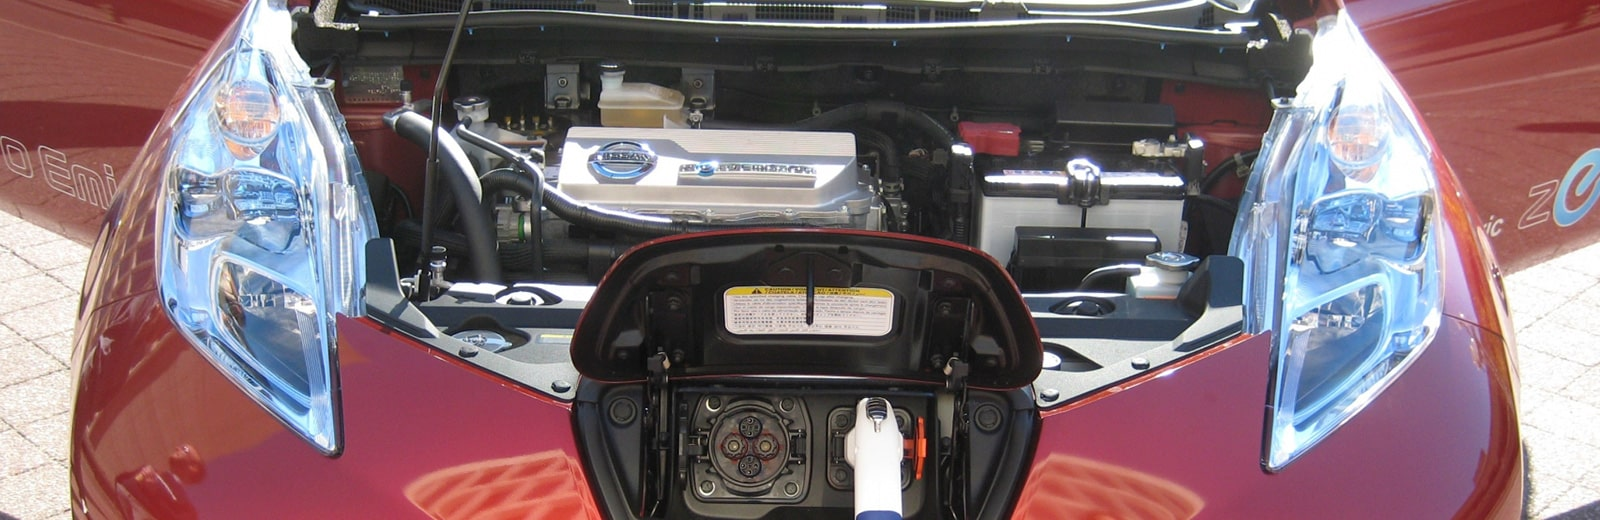 electric-car-maintenance